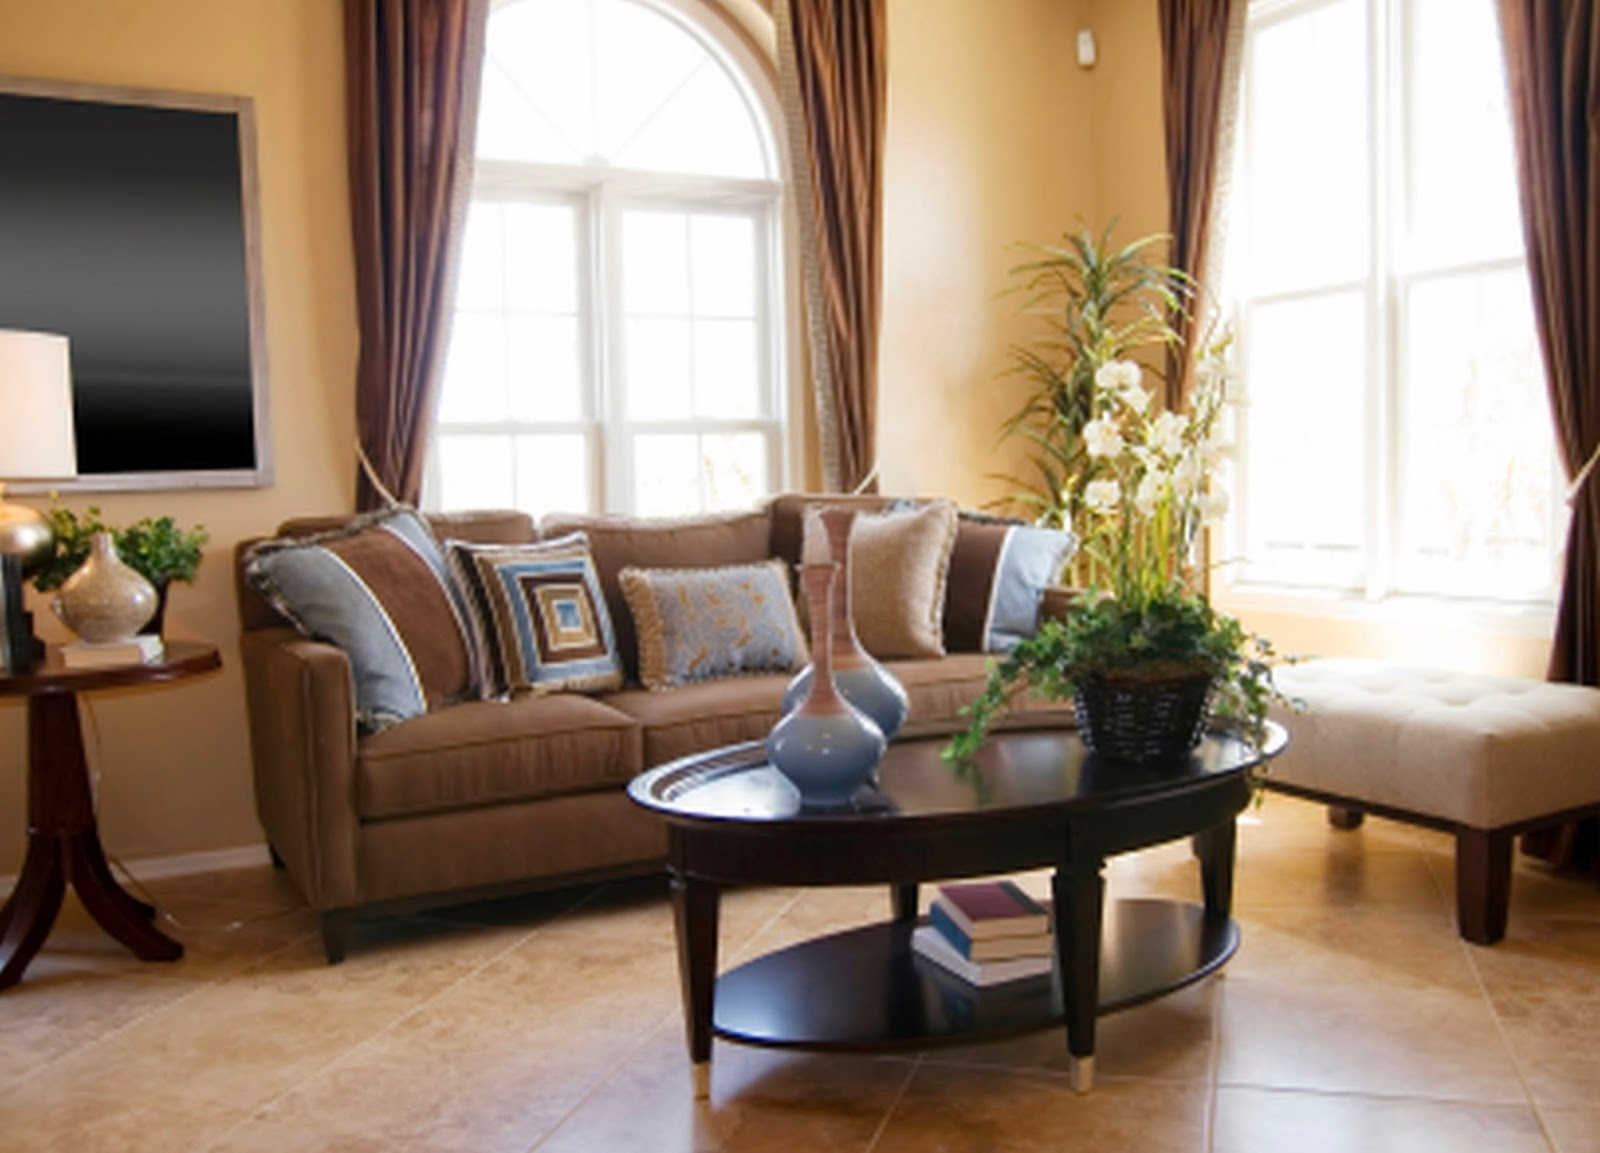 Captivating 80 Living Room Decorating Ideas Budget Inspiration Of